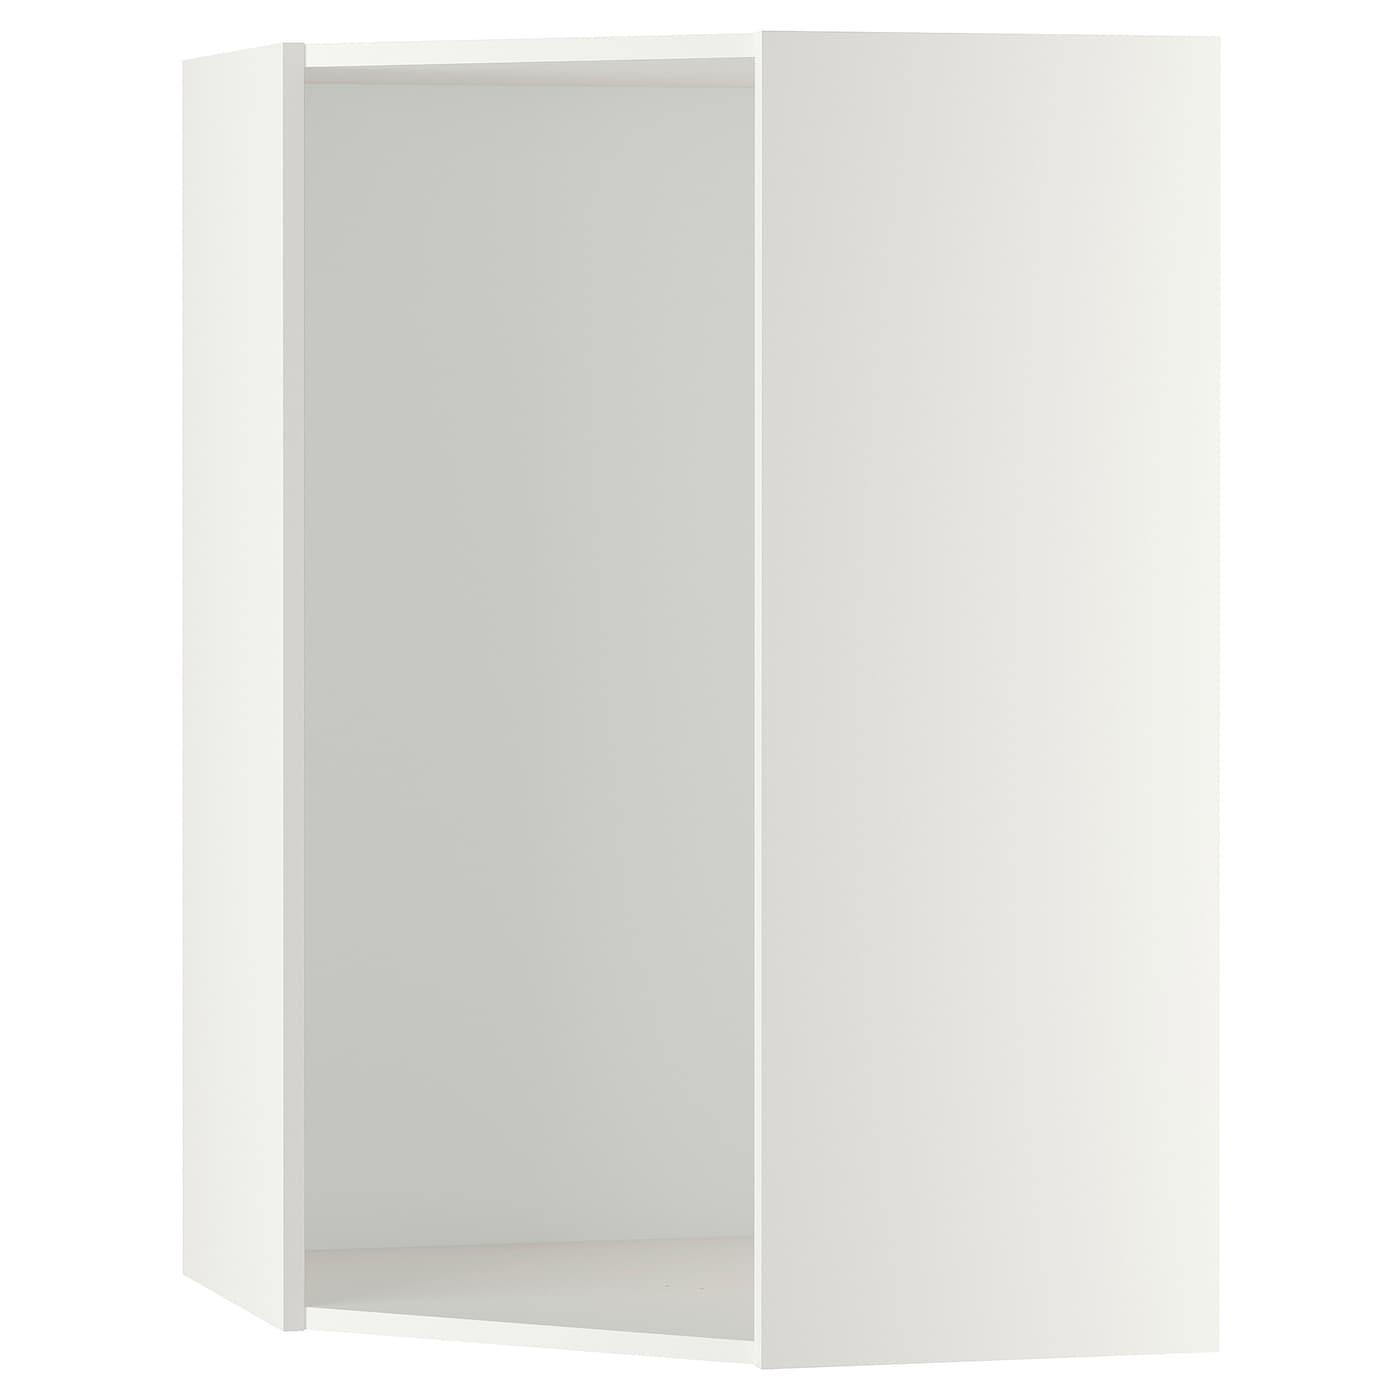 Metod Corner Wall Cabinet Frame White 68x68x100 Cm Ikea